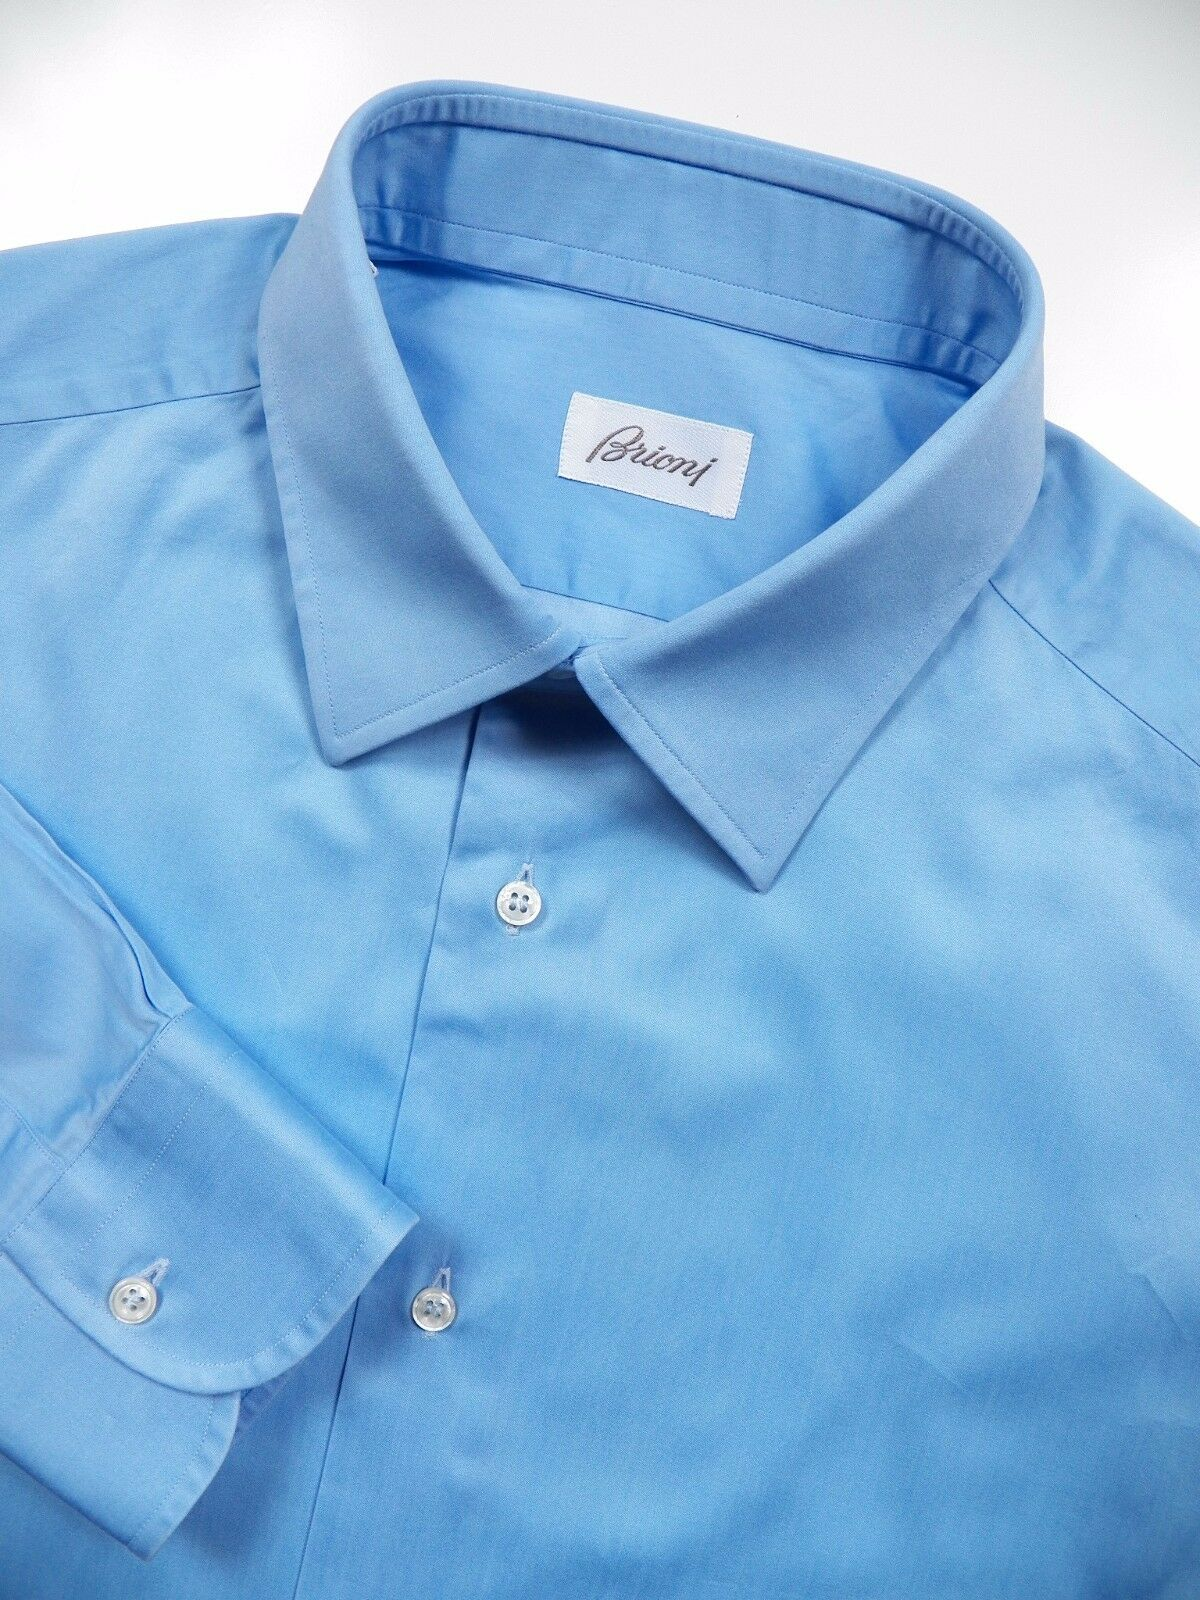 BRIONI herren 17 XL 36 LUXURY DRESS hemd LUSTROUS SILKY SKY Blau MADE IN ITALY